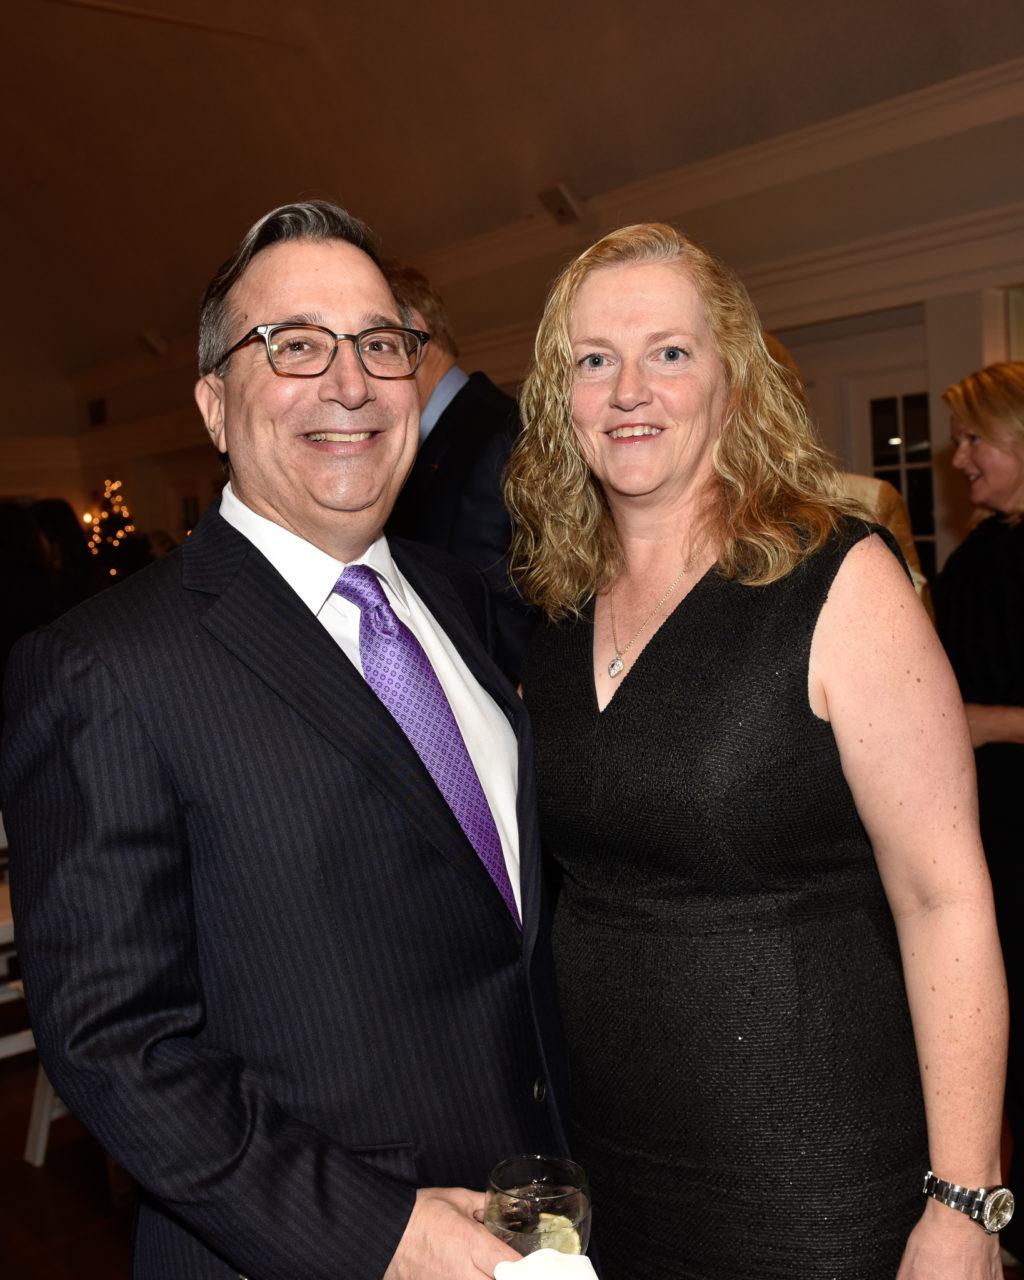 Michael and Jennifer Freitag